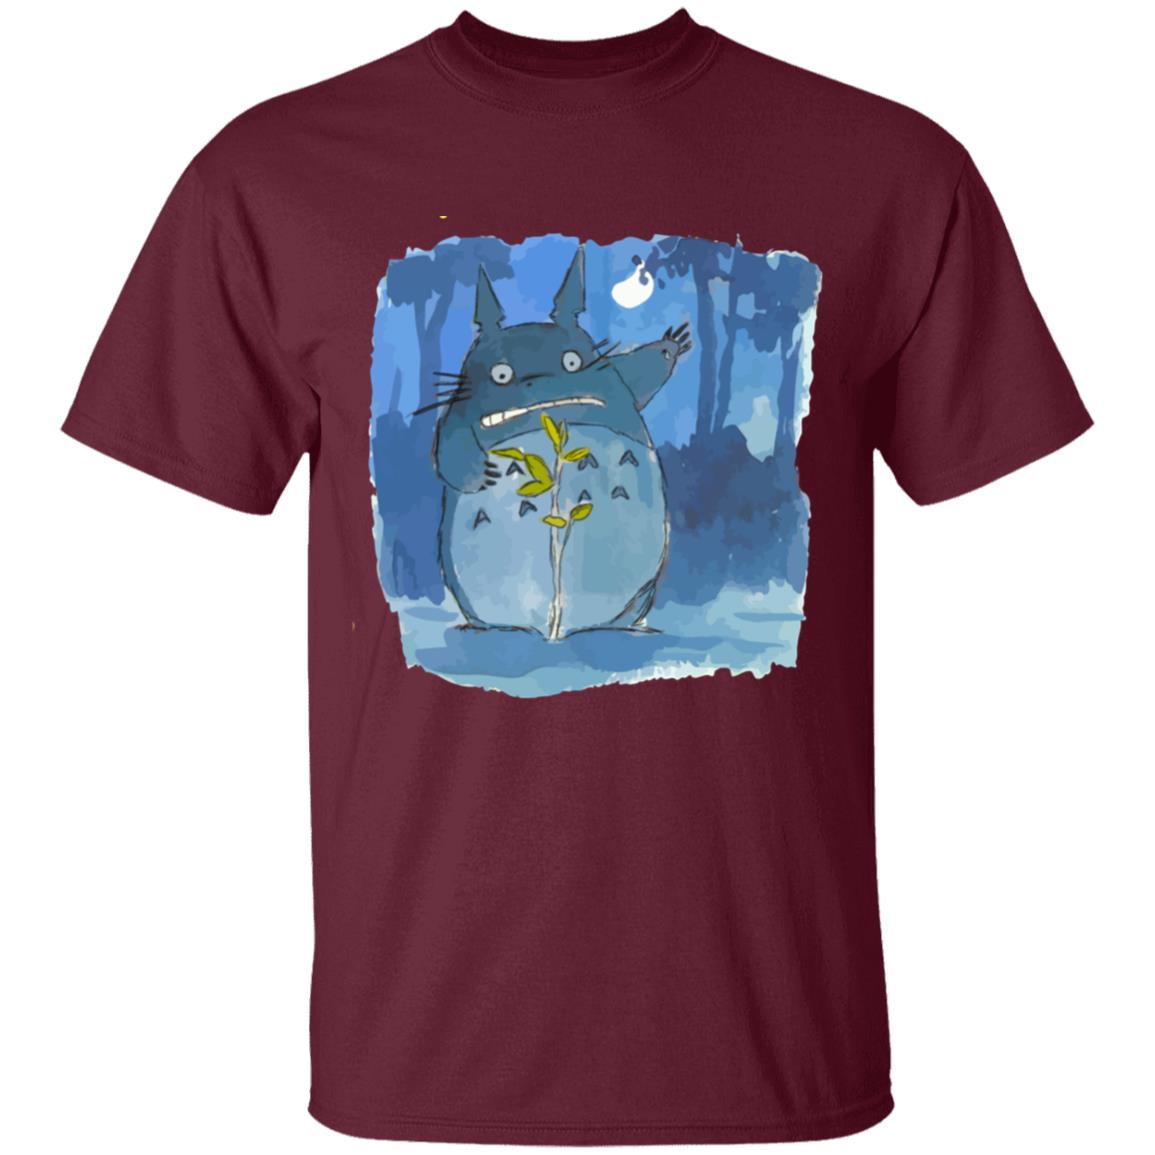 My Neighbor Totoro – Midnight Planting T Shirt Unisex